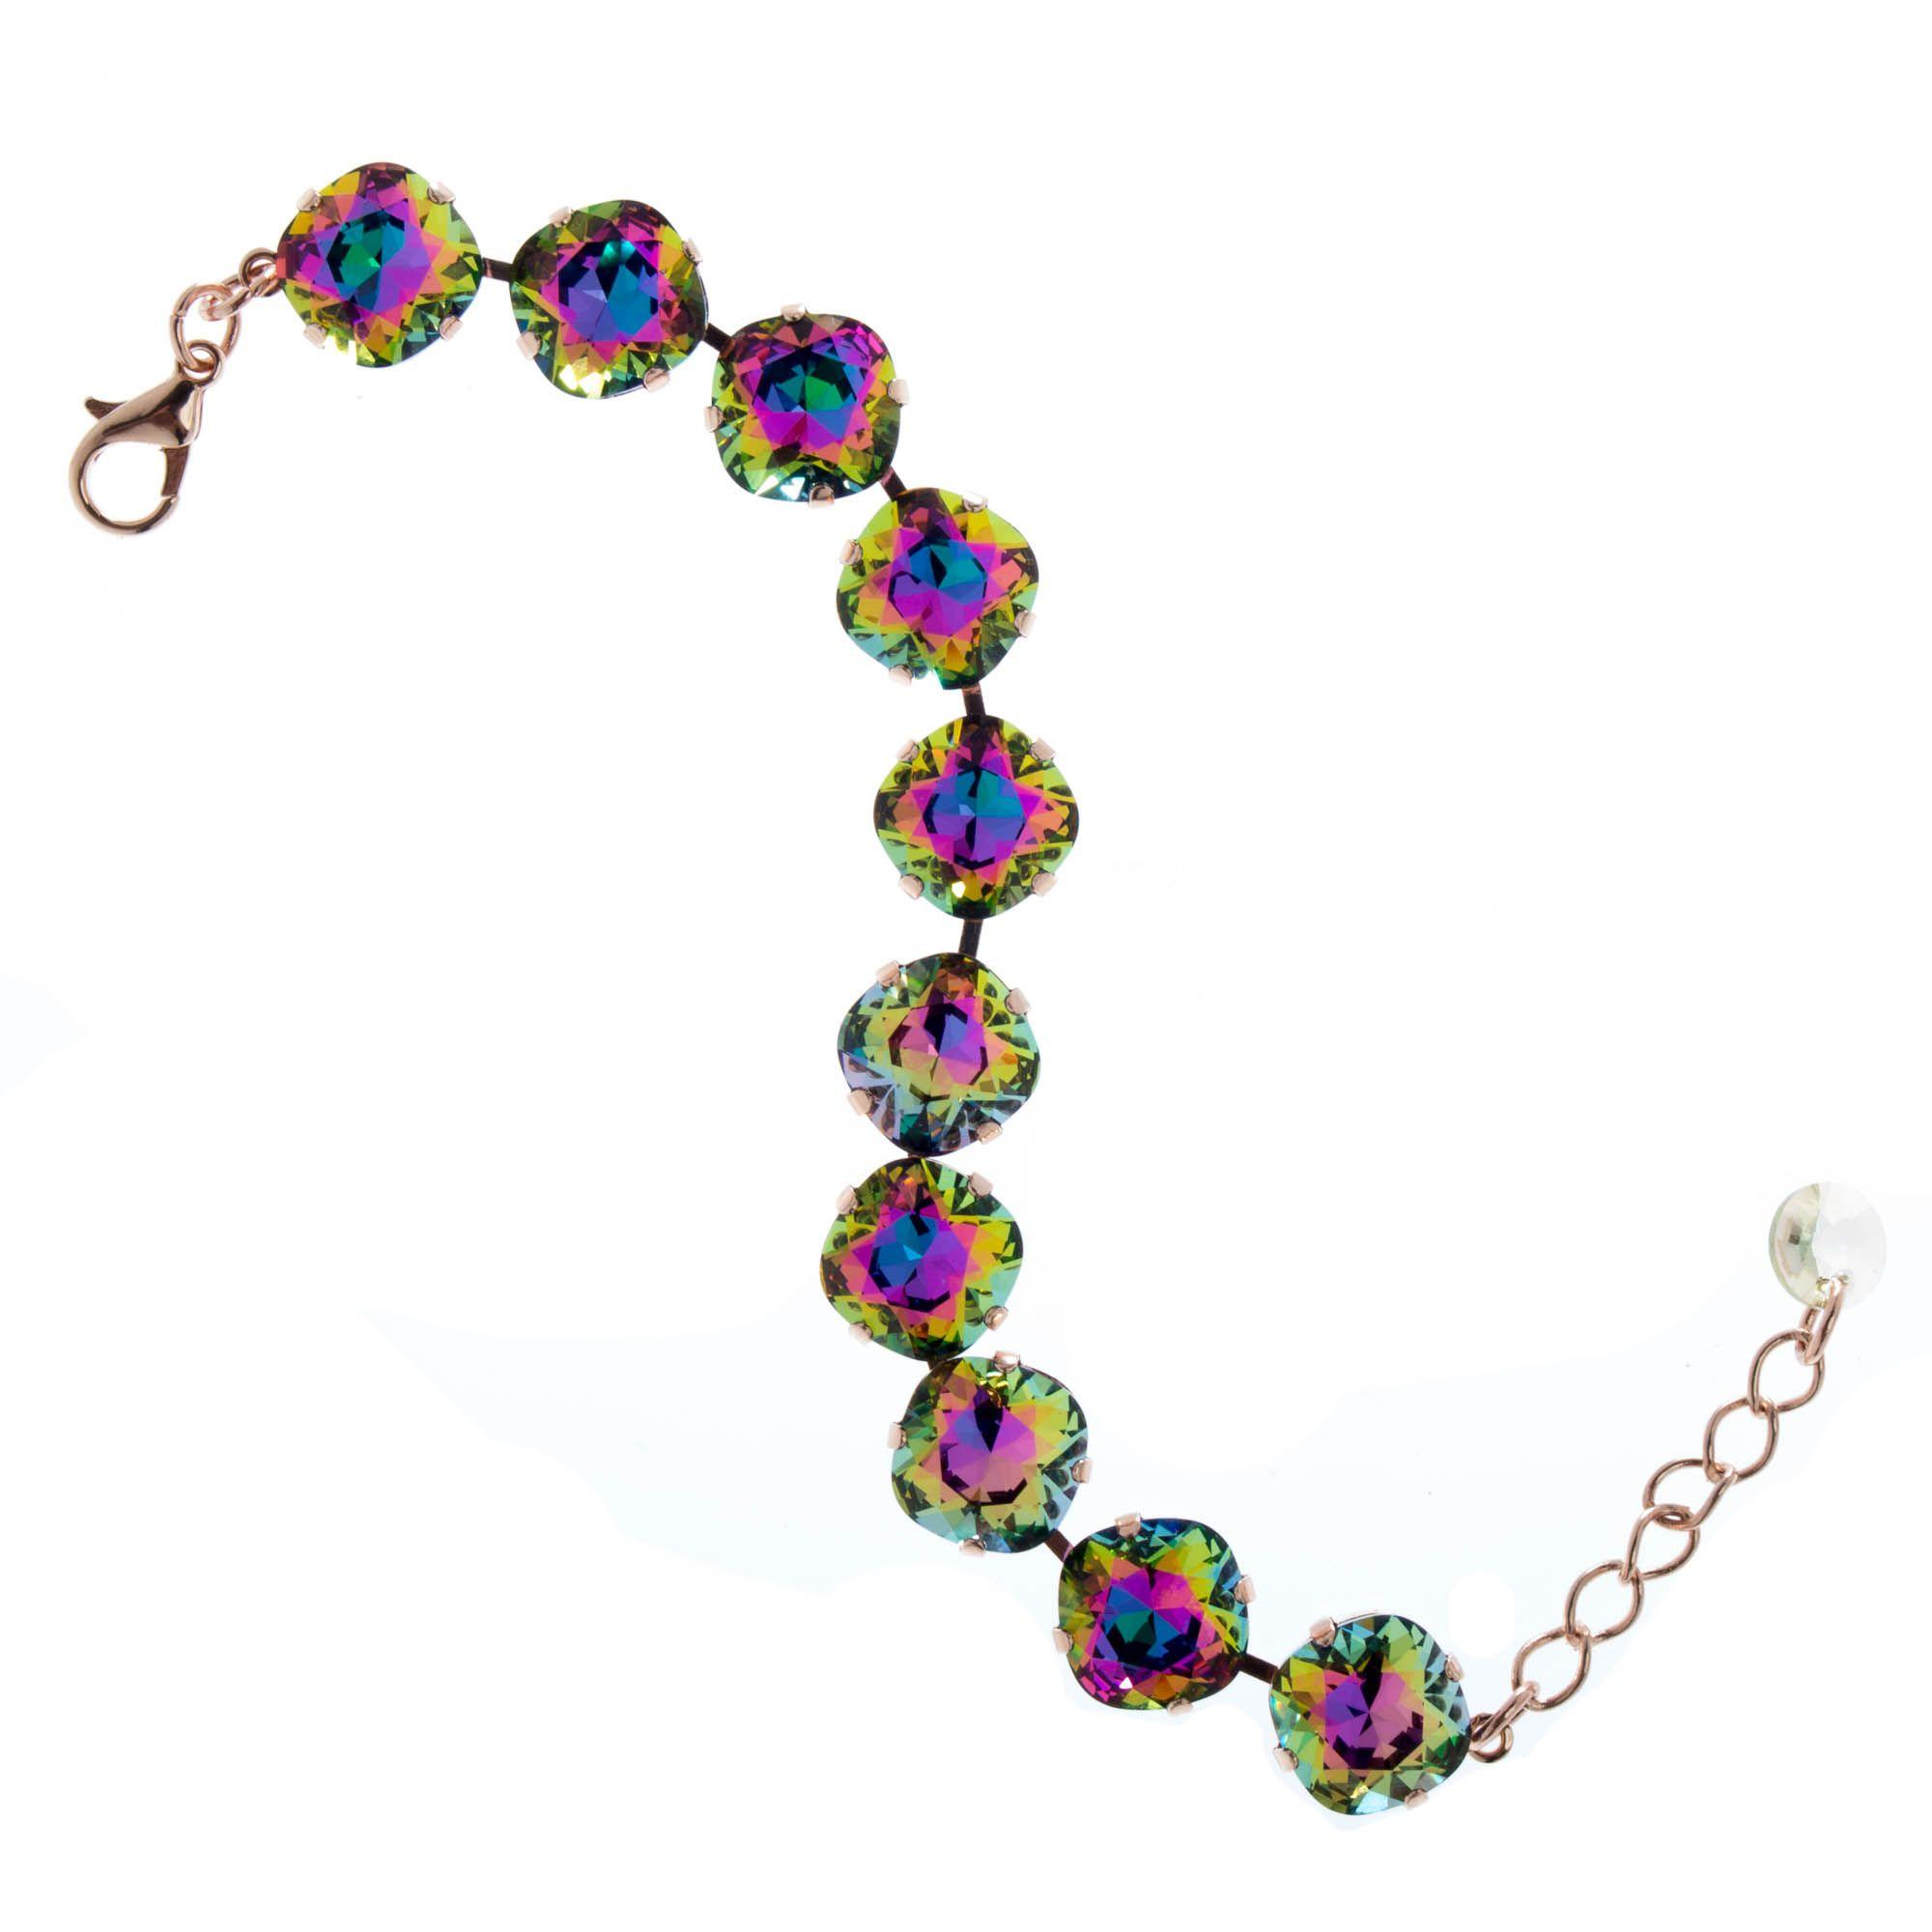 94a1c0c387f462 Lisa Marie Jewelry 12mm Square Swarovski Crystal Bracelet - Electra